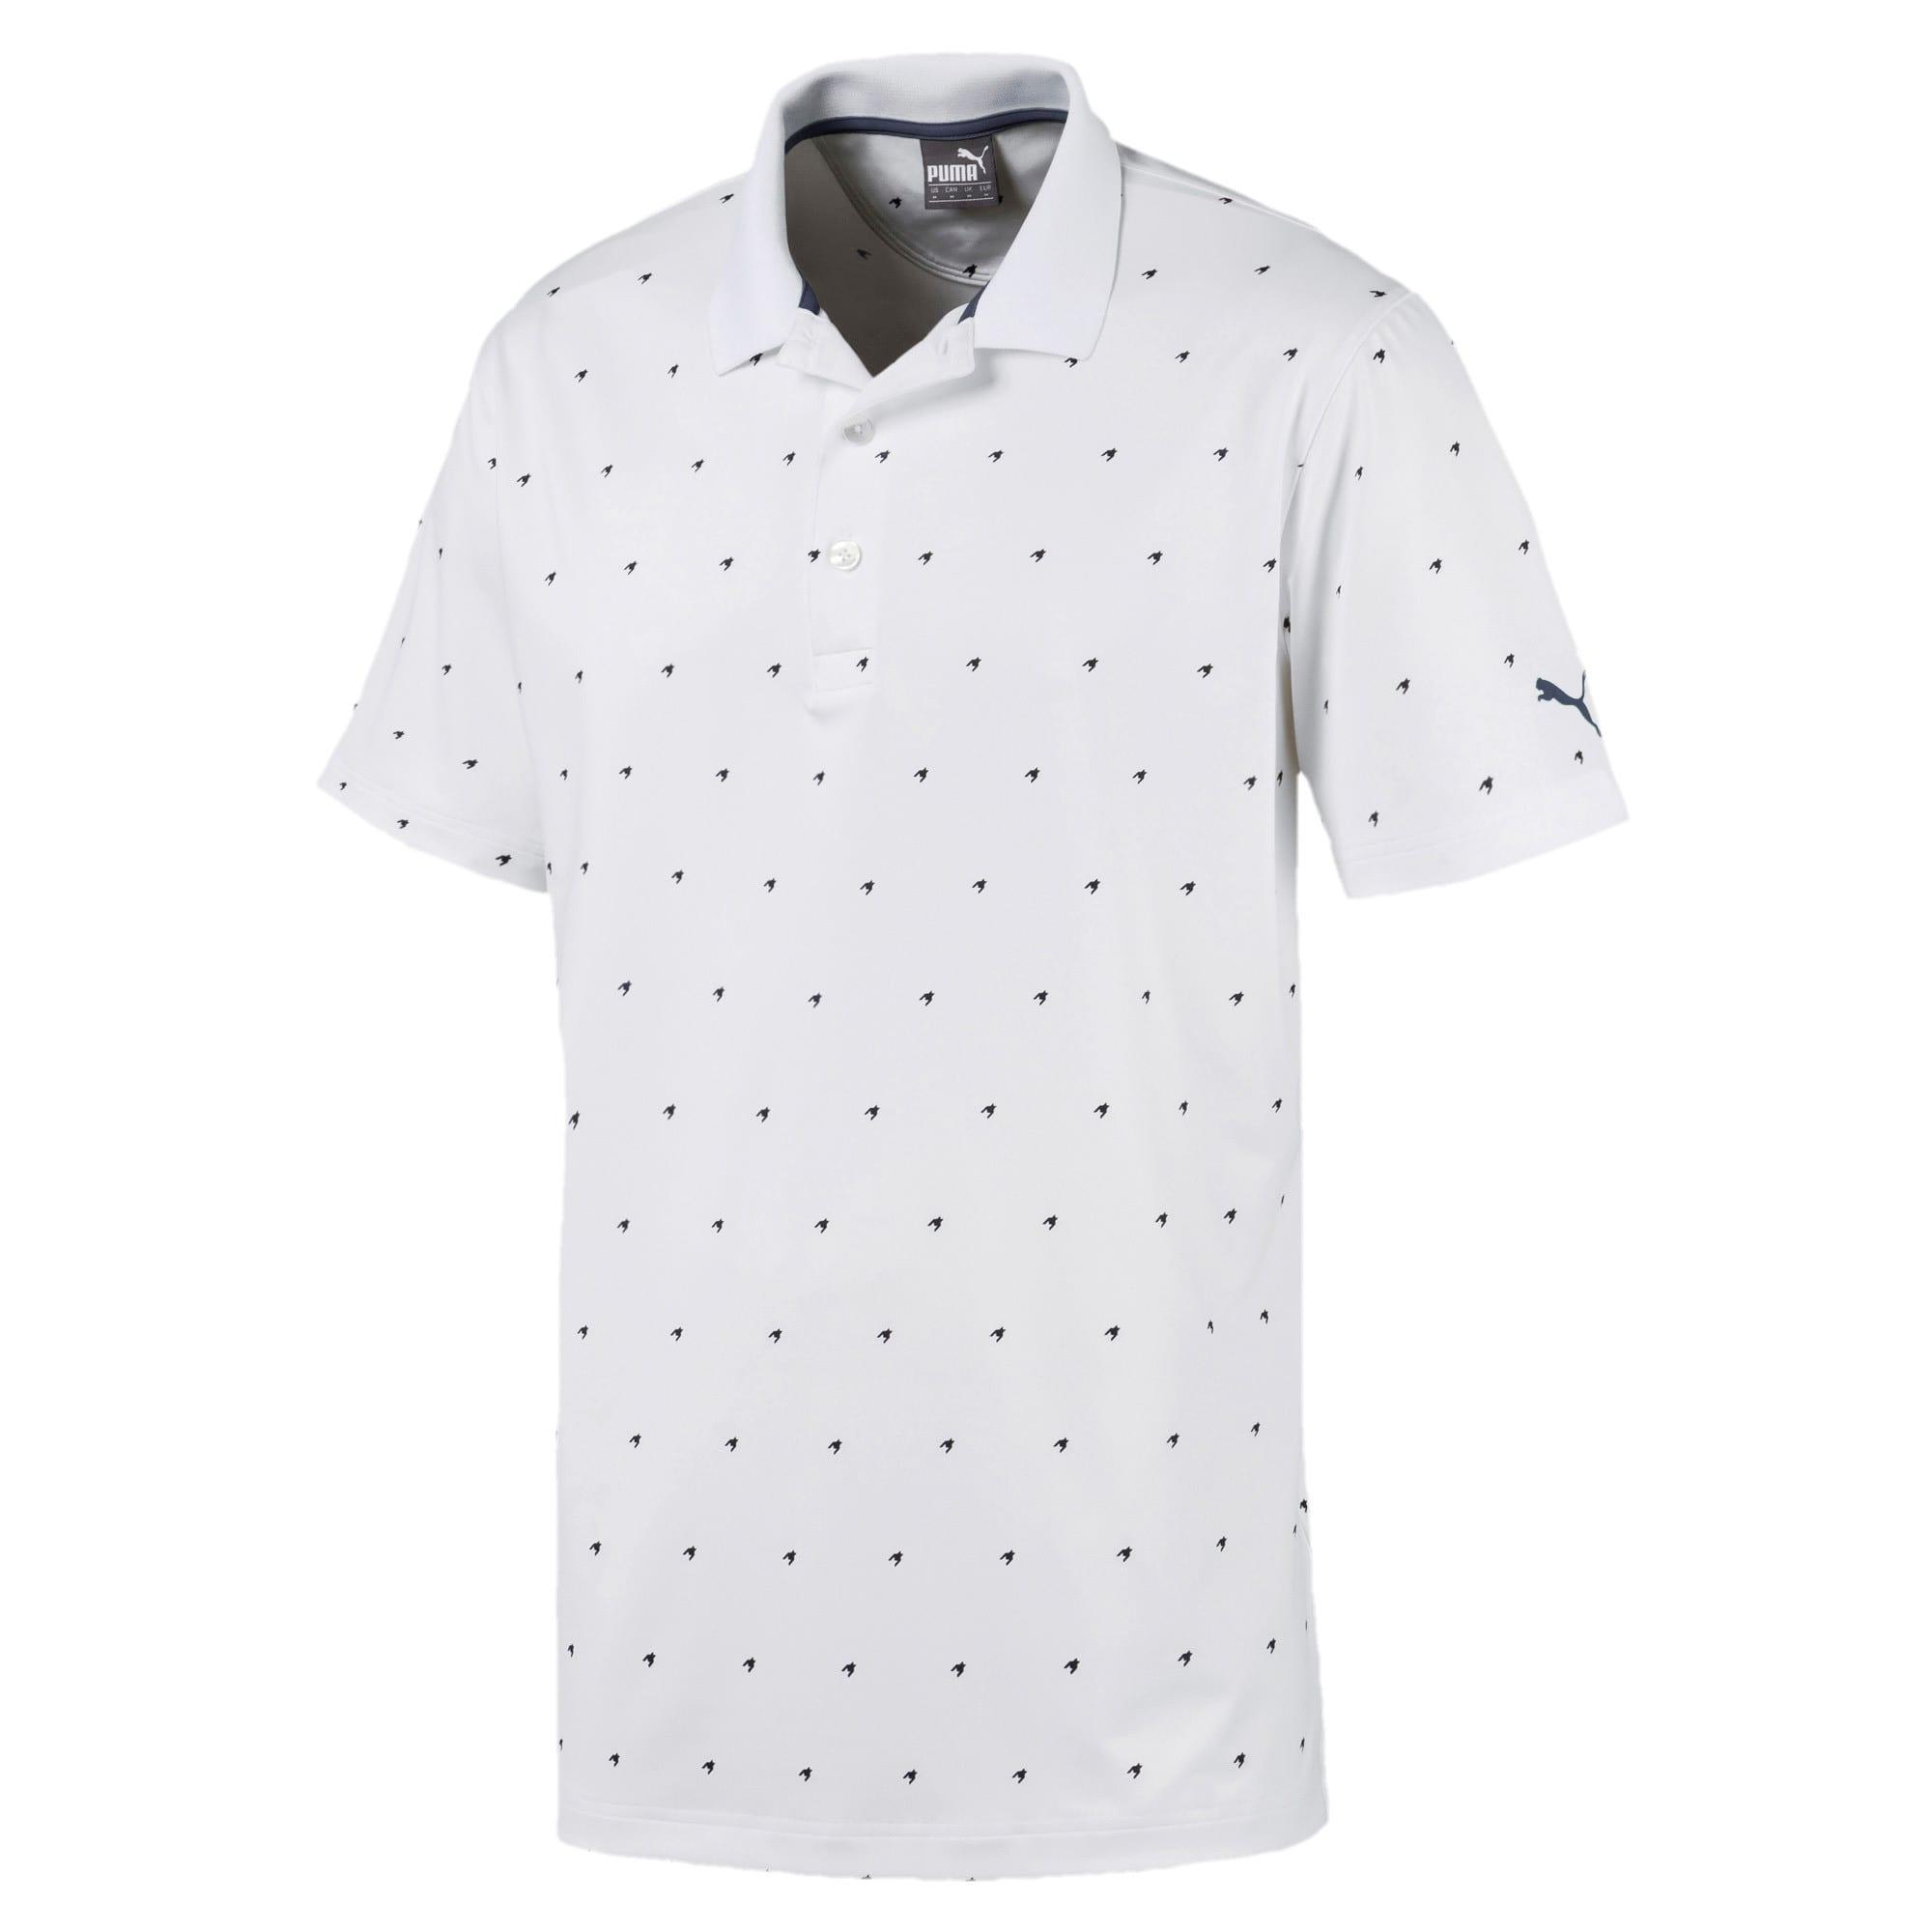 Thumbnail 4 of Skerries Men's Golf Polo, Bright White, medium